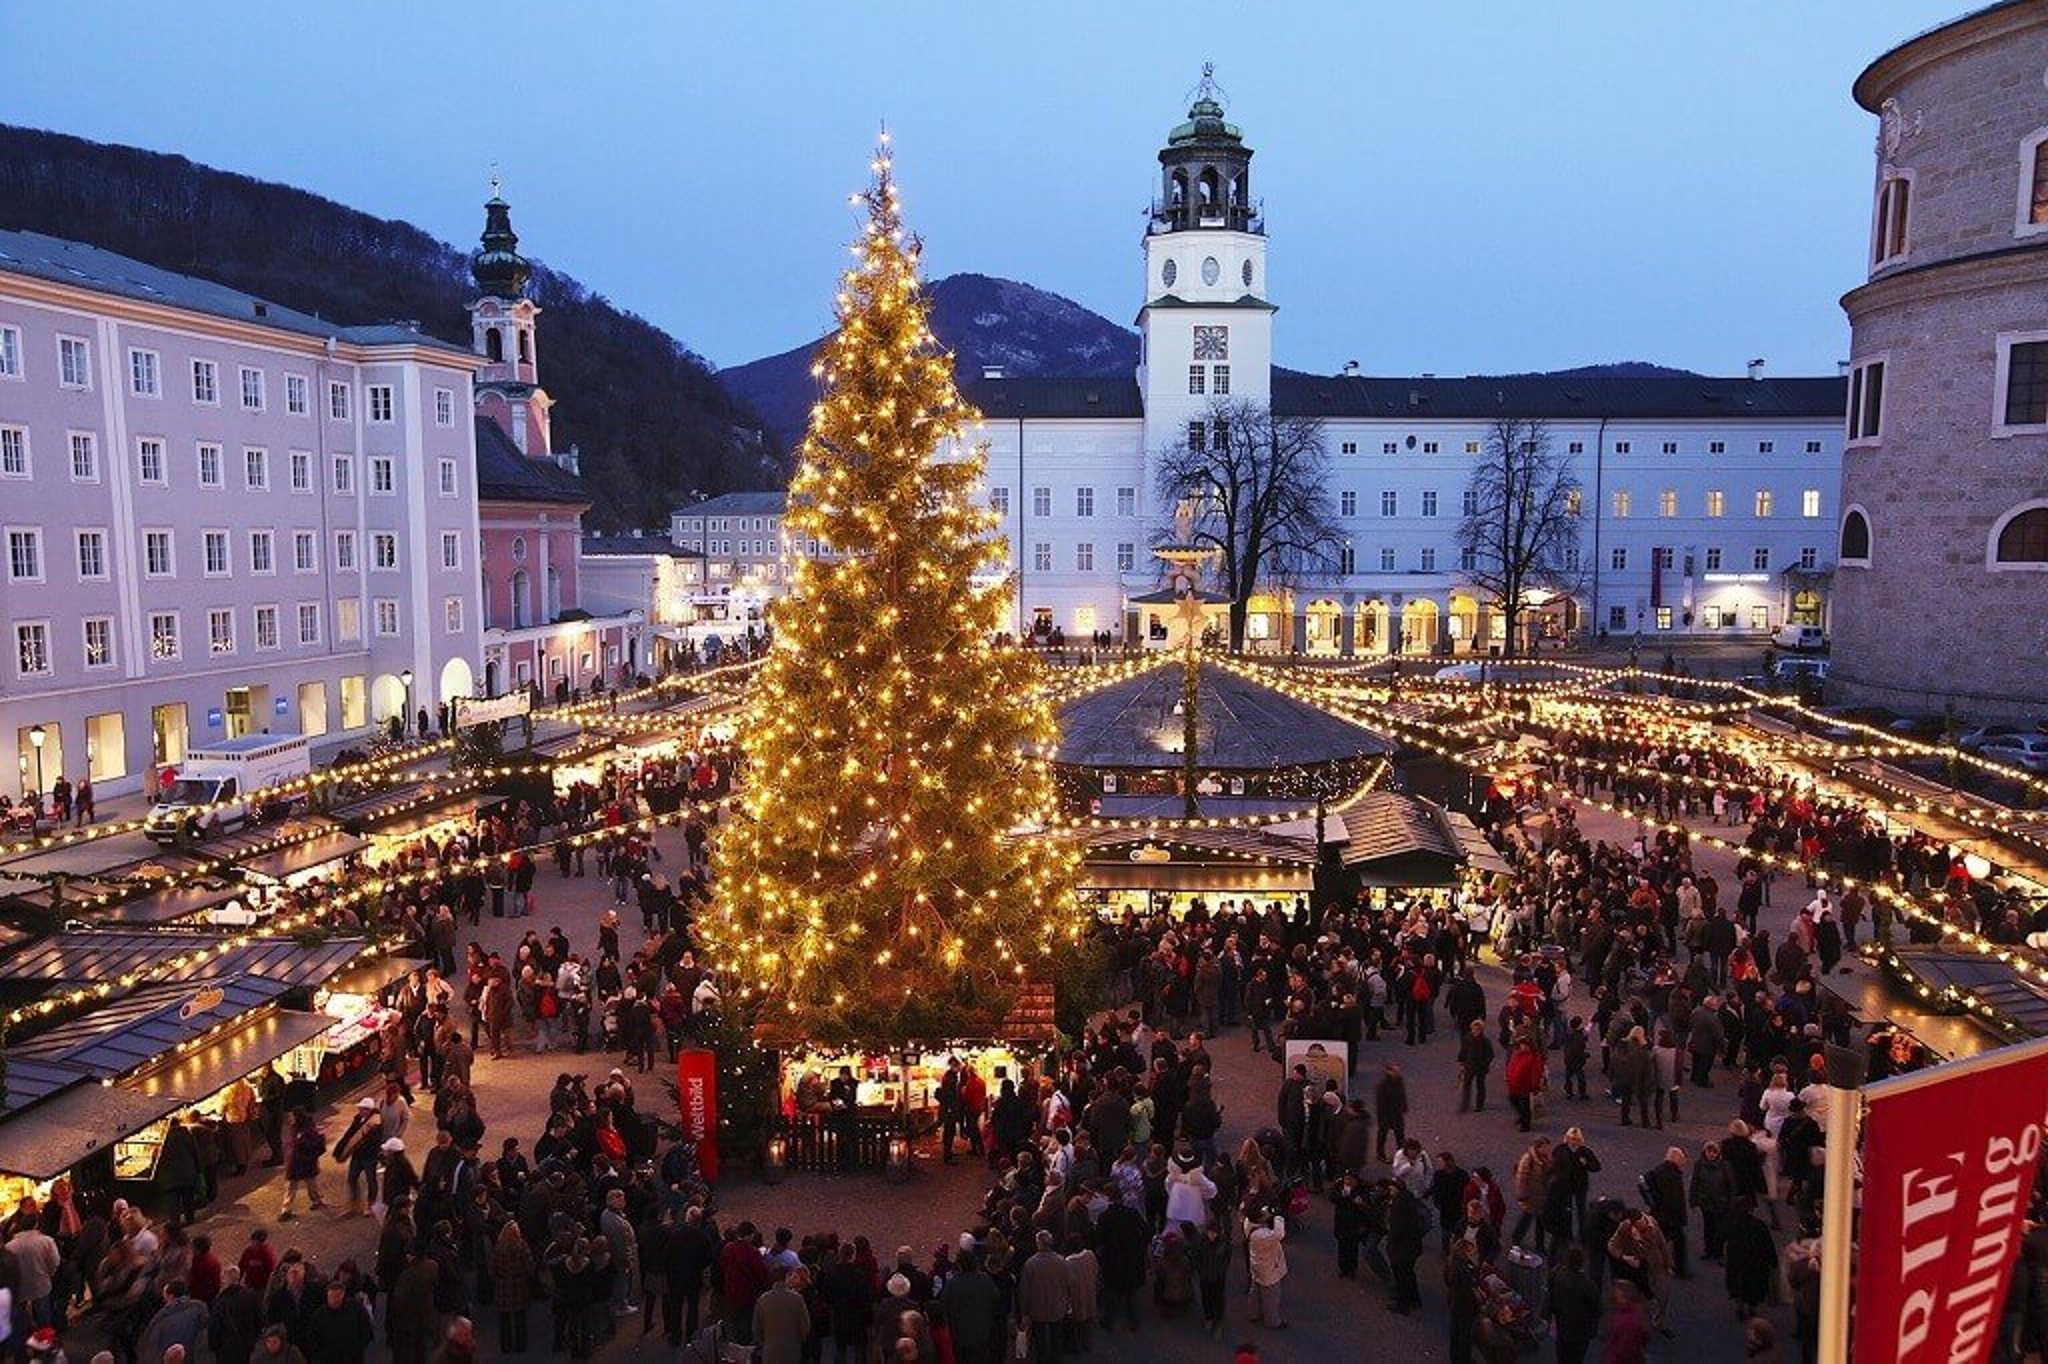 Christkindlmarkt, mercado navideño de Salzburgo